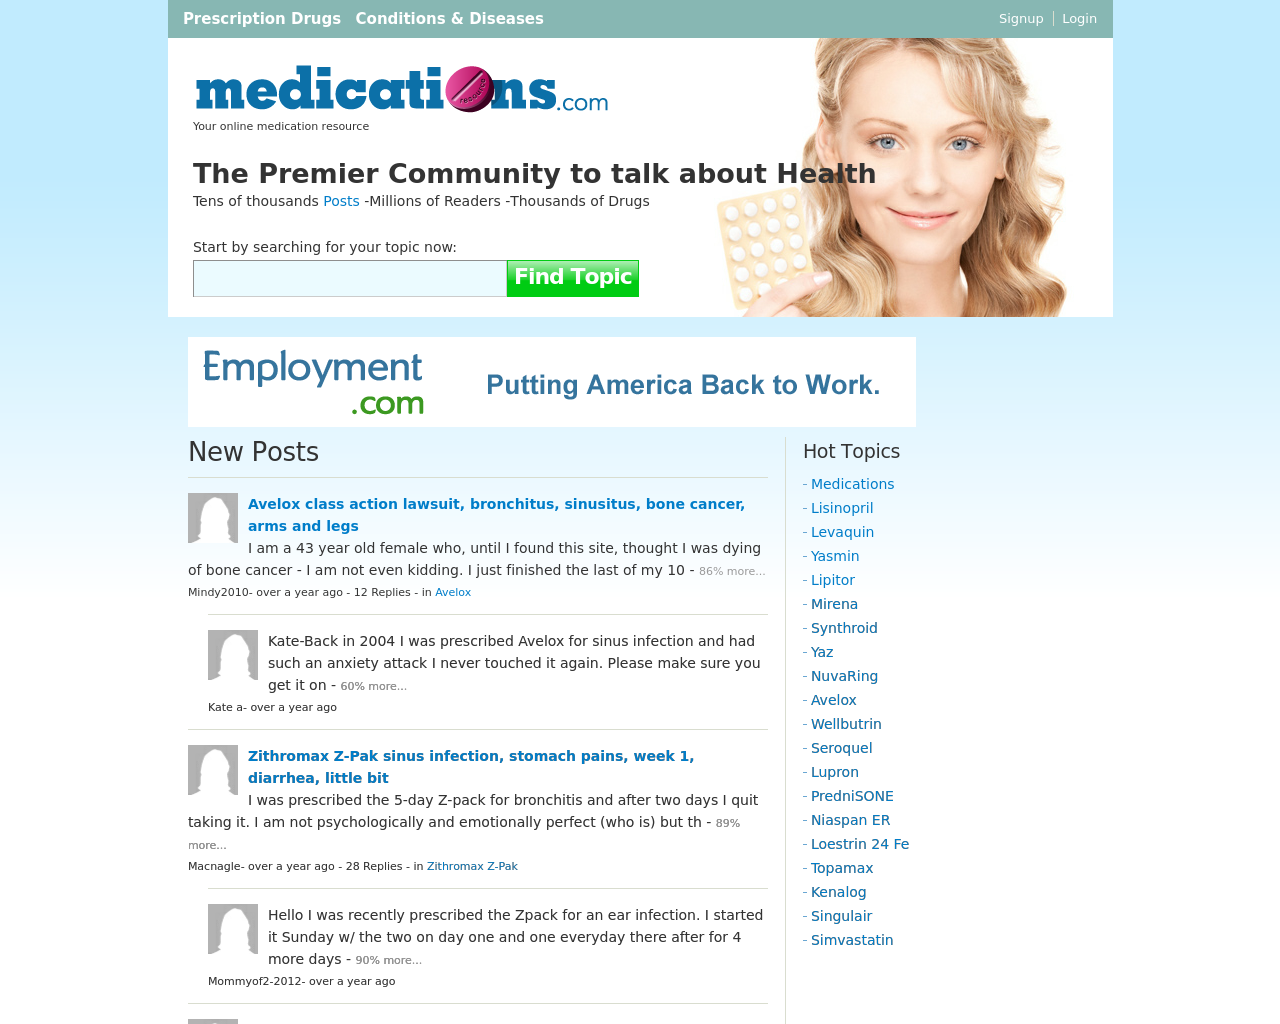 medications.com-Advertising-Reviews-Pricing